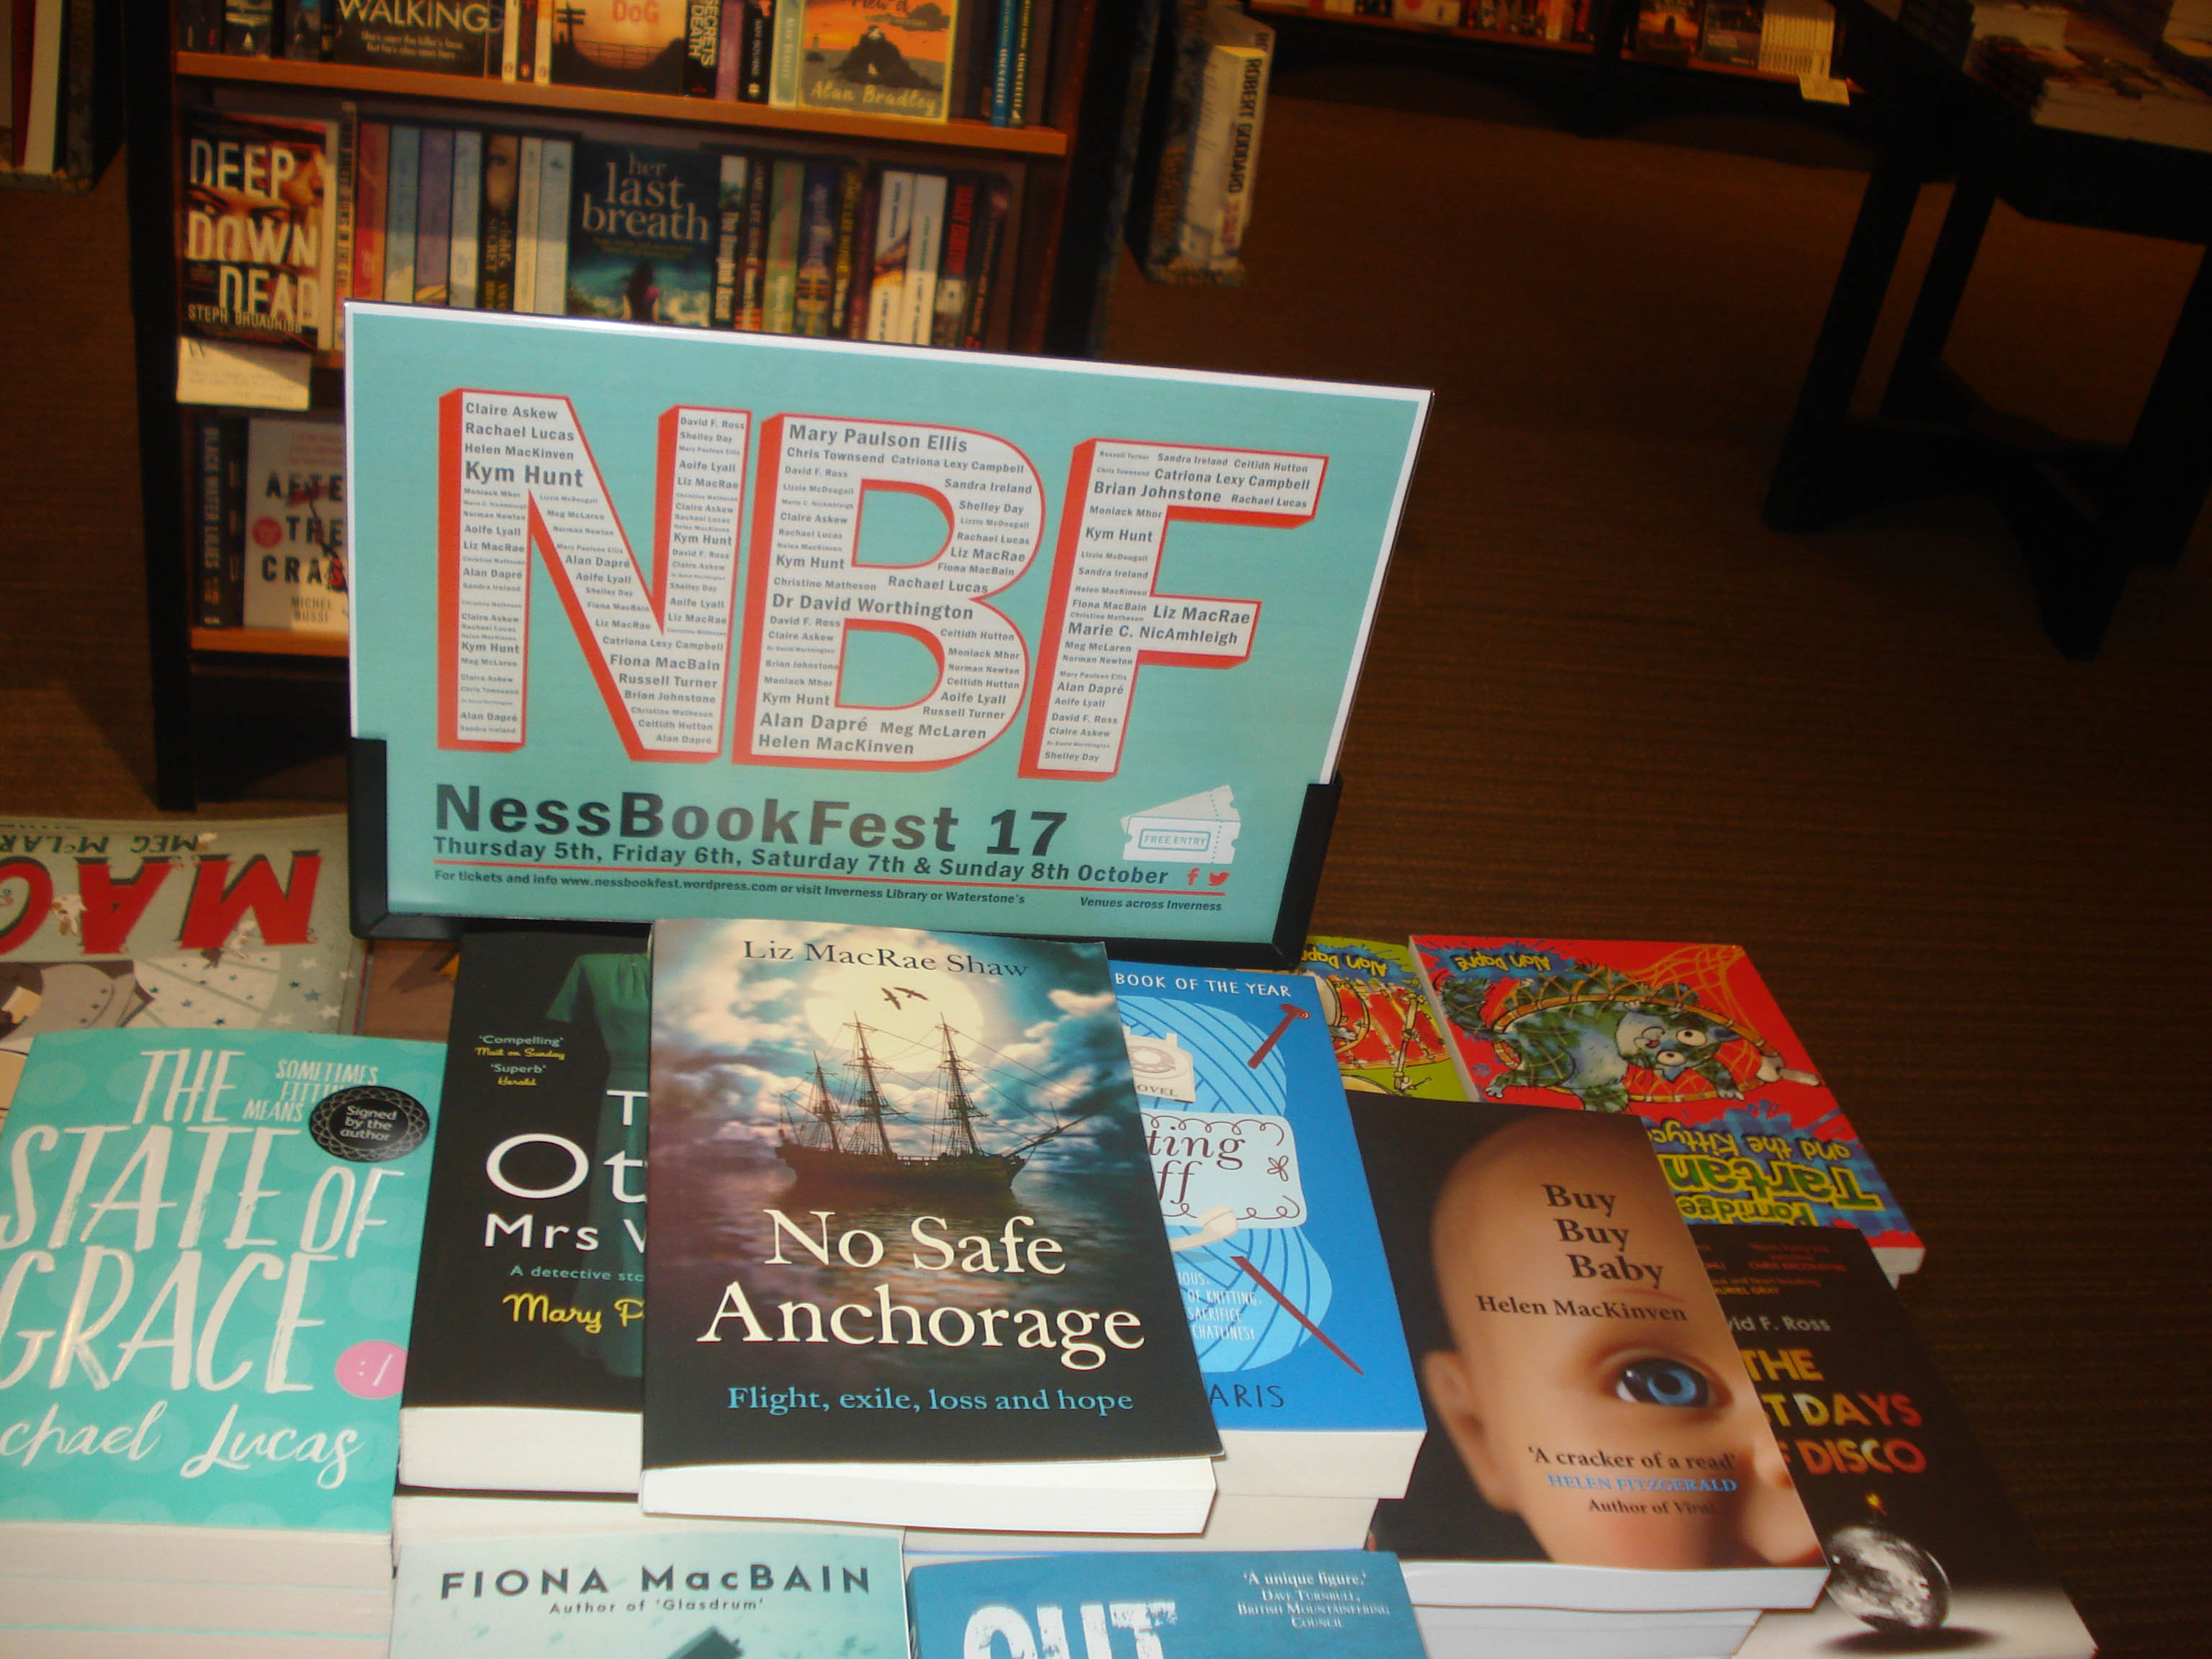 Nrdd Book Fest